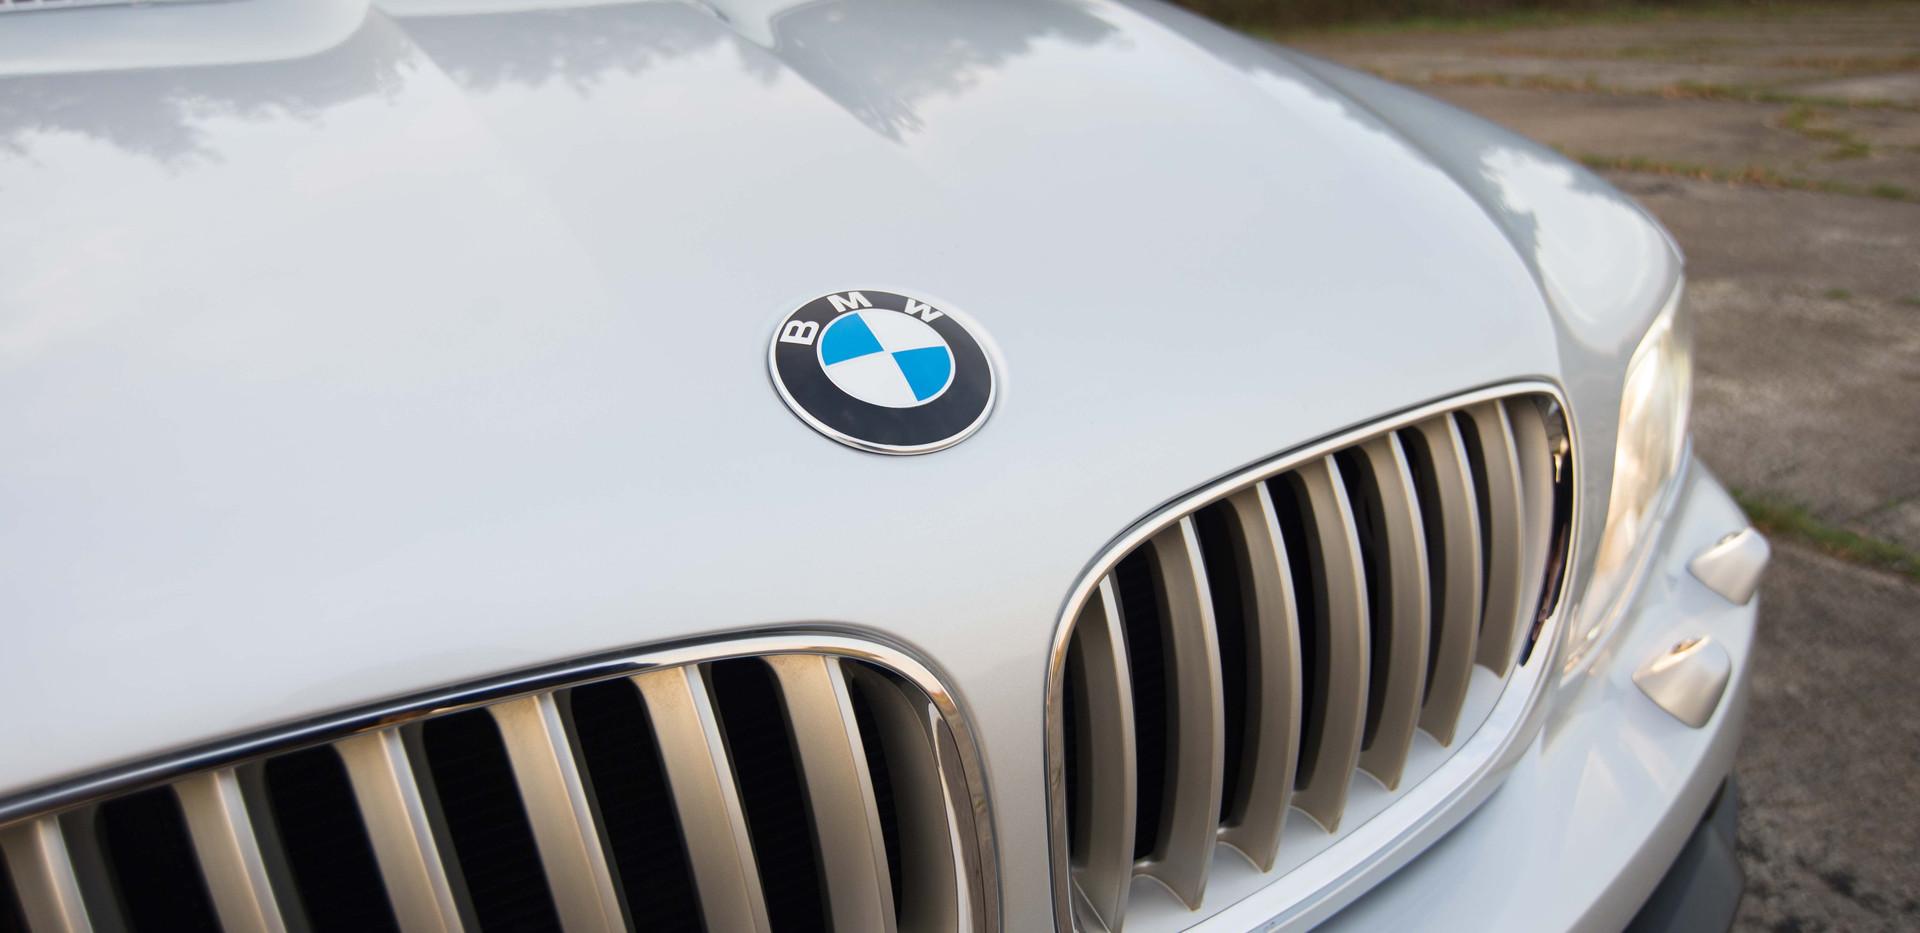 BMW E53 X5 4.4i For Sale UK London  (31